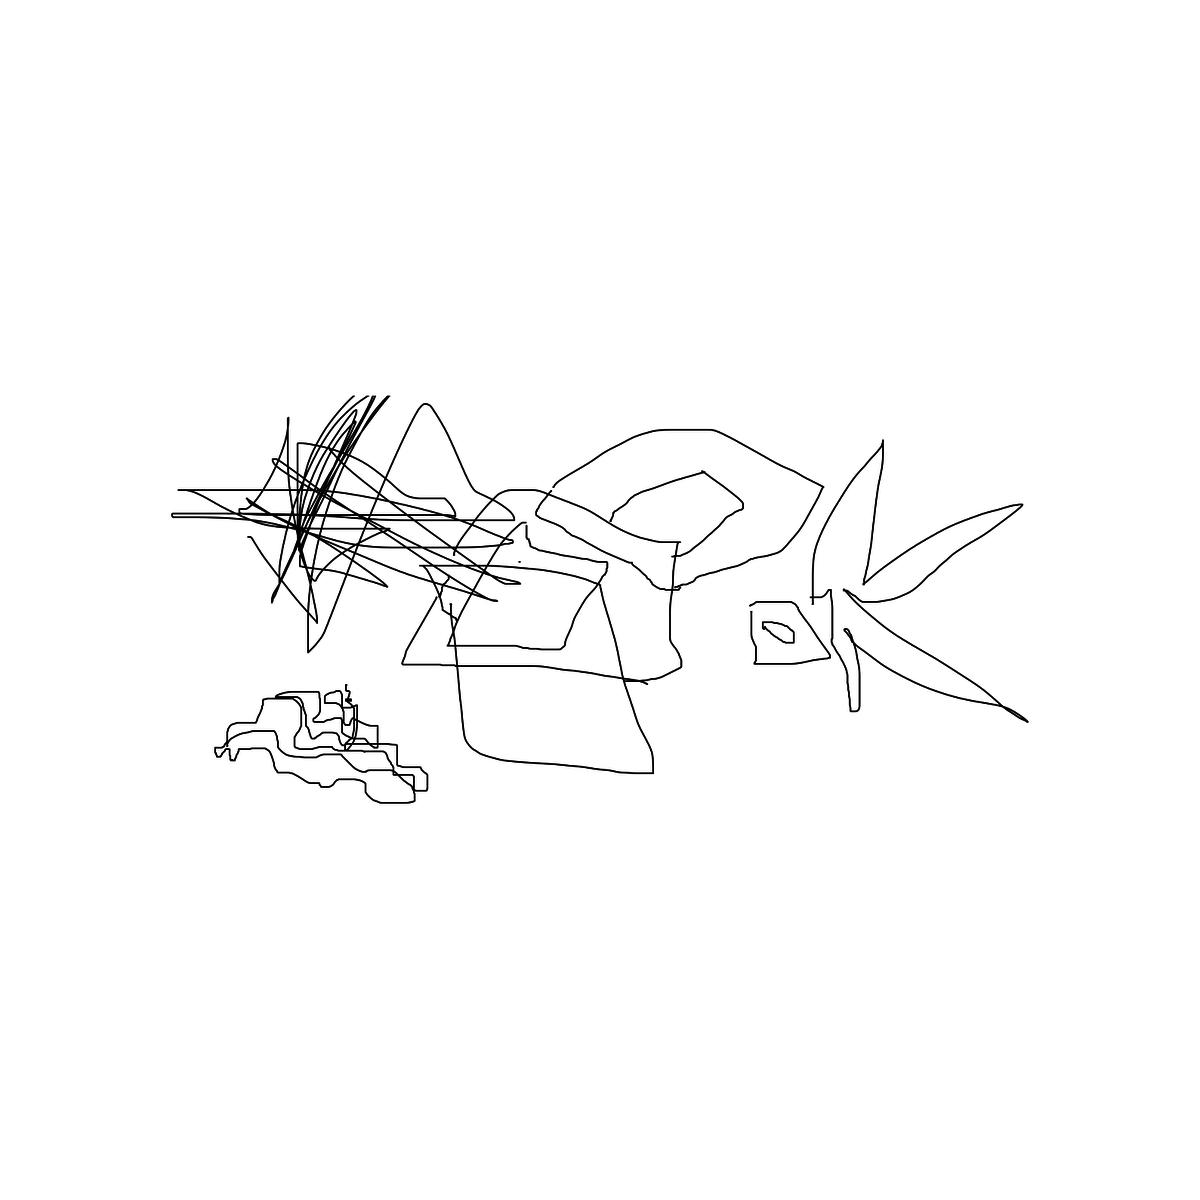 BAAAM drawing#1620 lat:50.0560150146484400lng: 19.9423236846923830